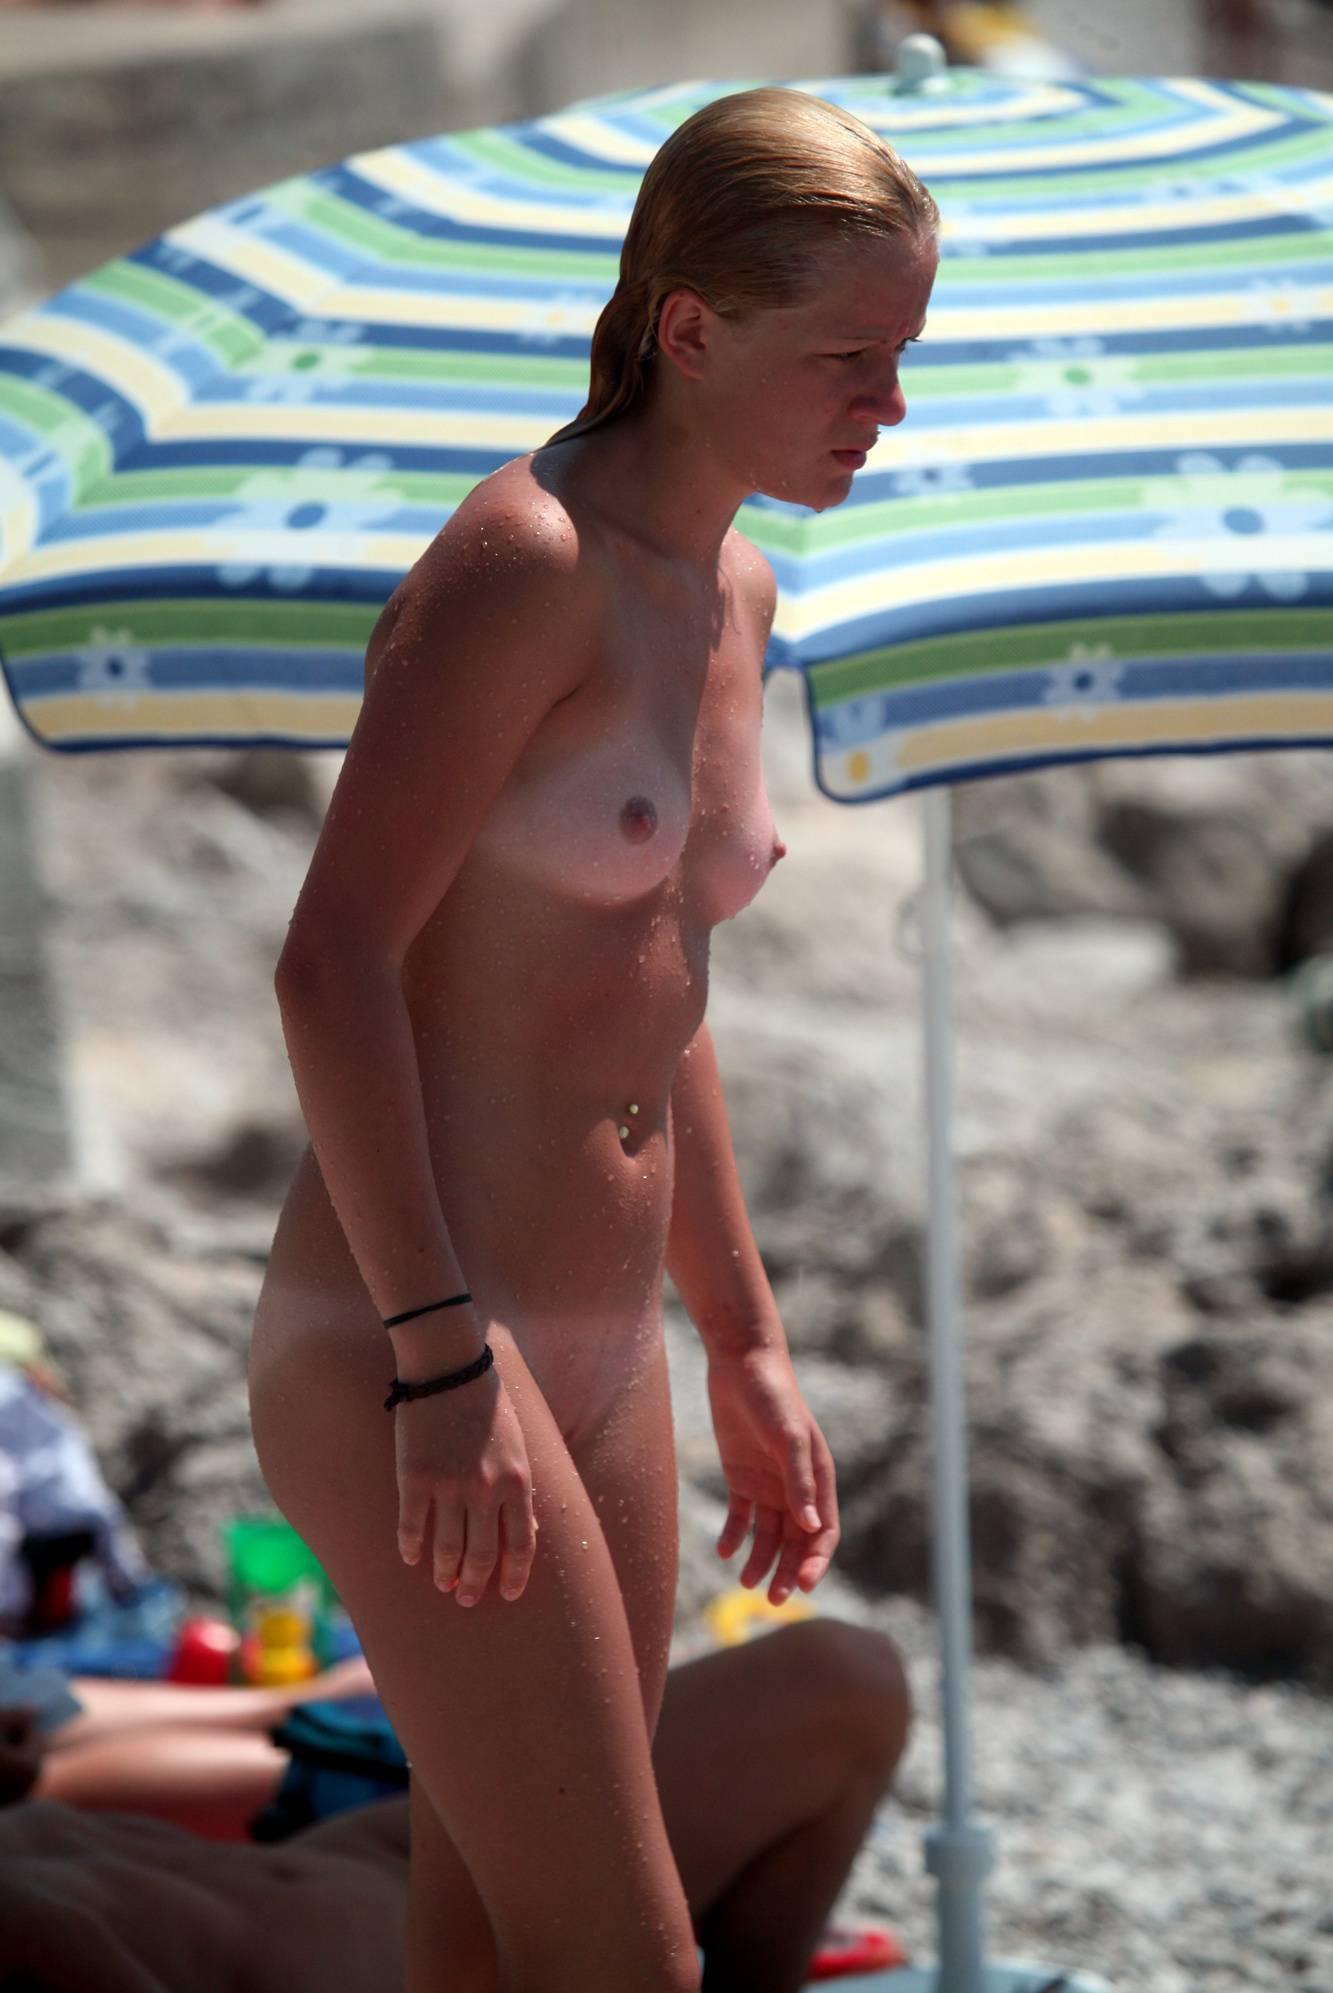 Nudist Beach Photo Tour - 1